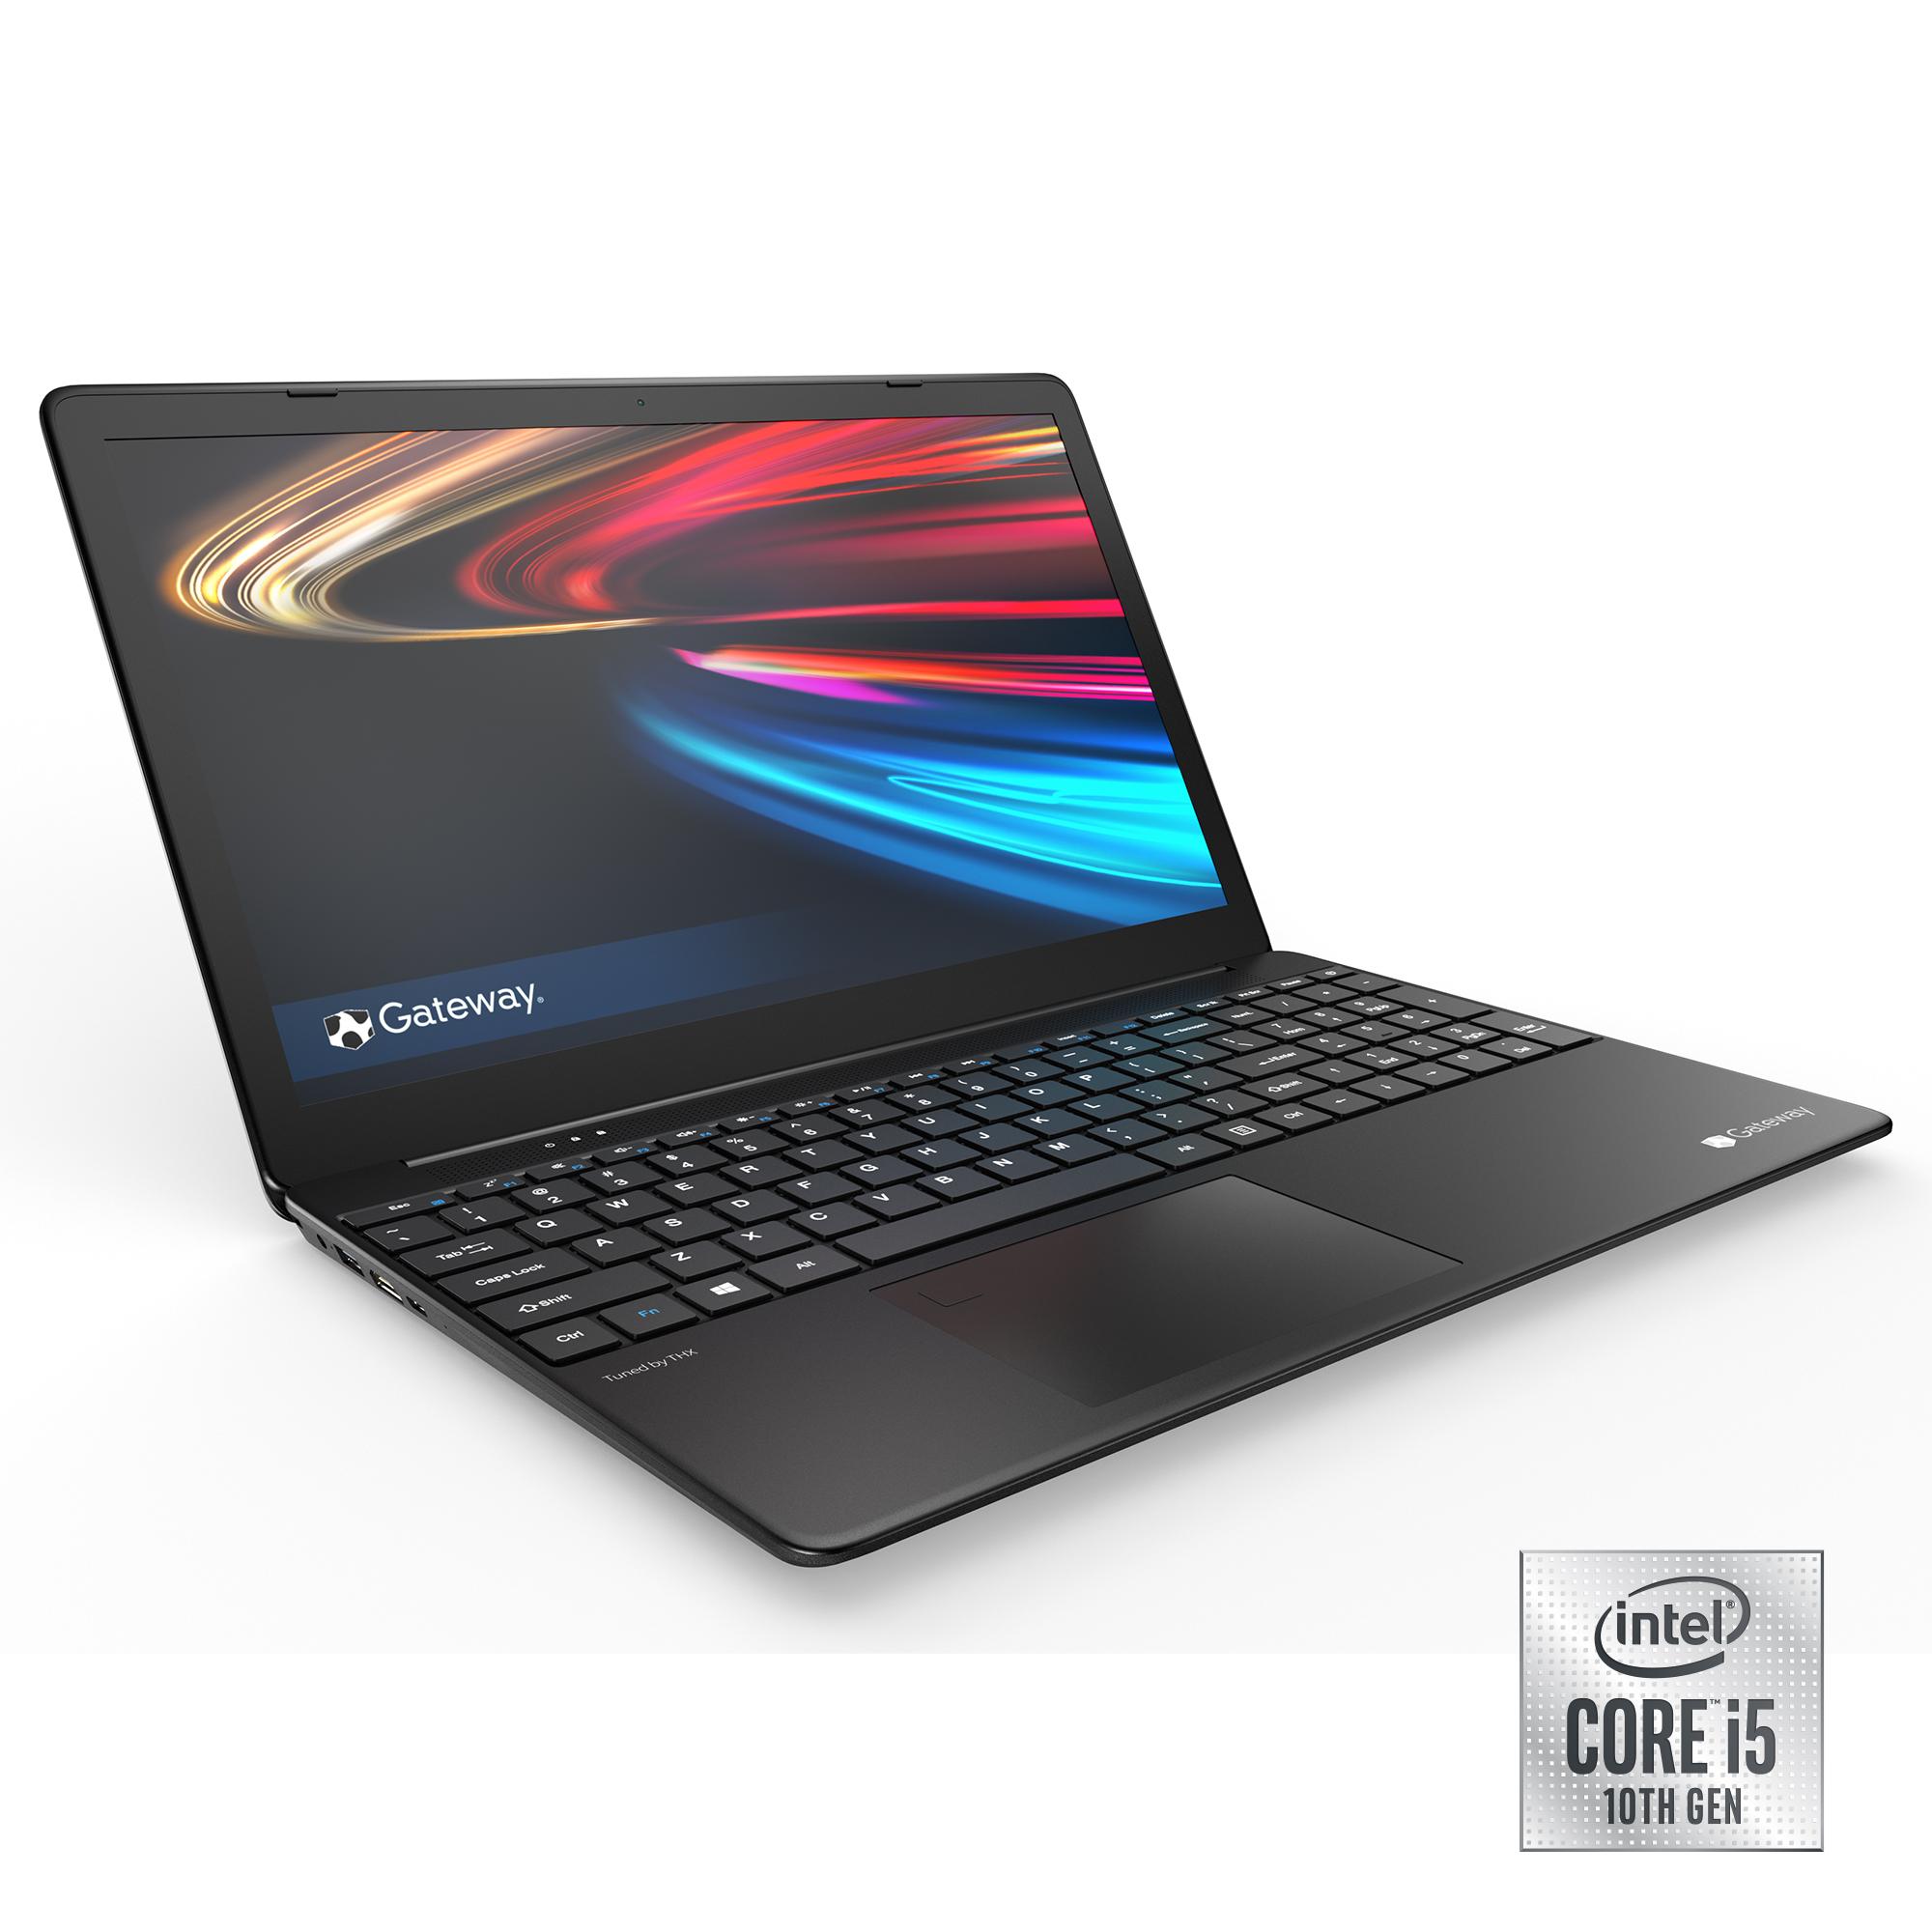 "Gateway 15.6"" FHD Ultra Slim Notebook, Intel Core i5-1035G1, 16GB RAM, 256GB SSD $499"